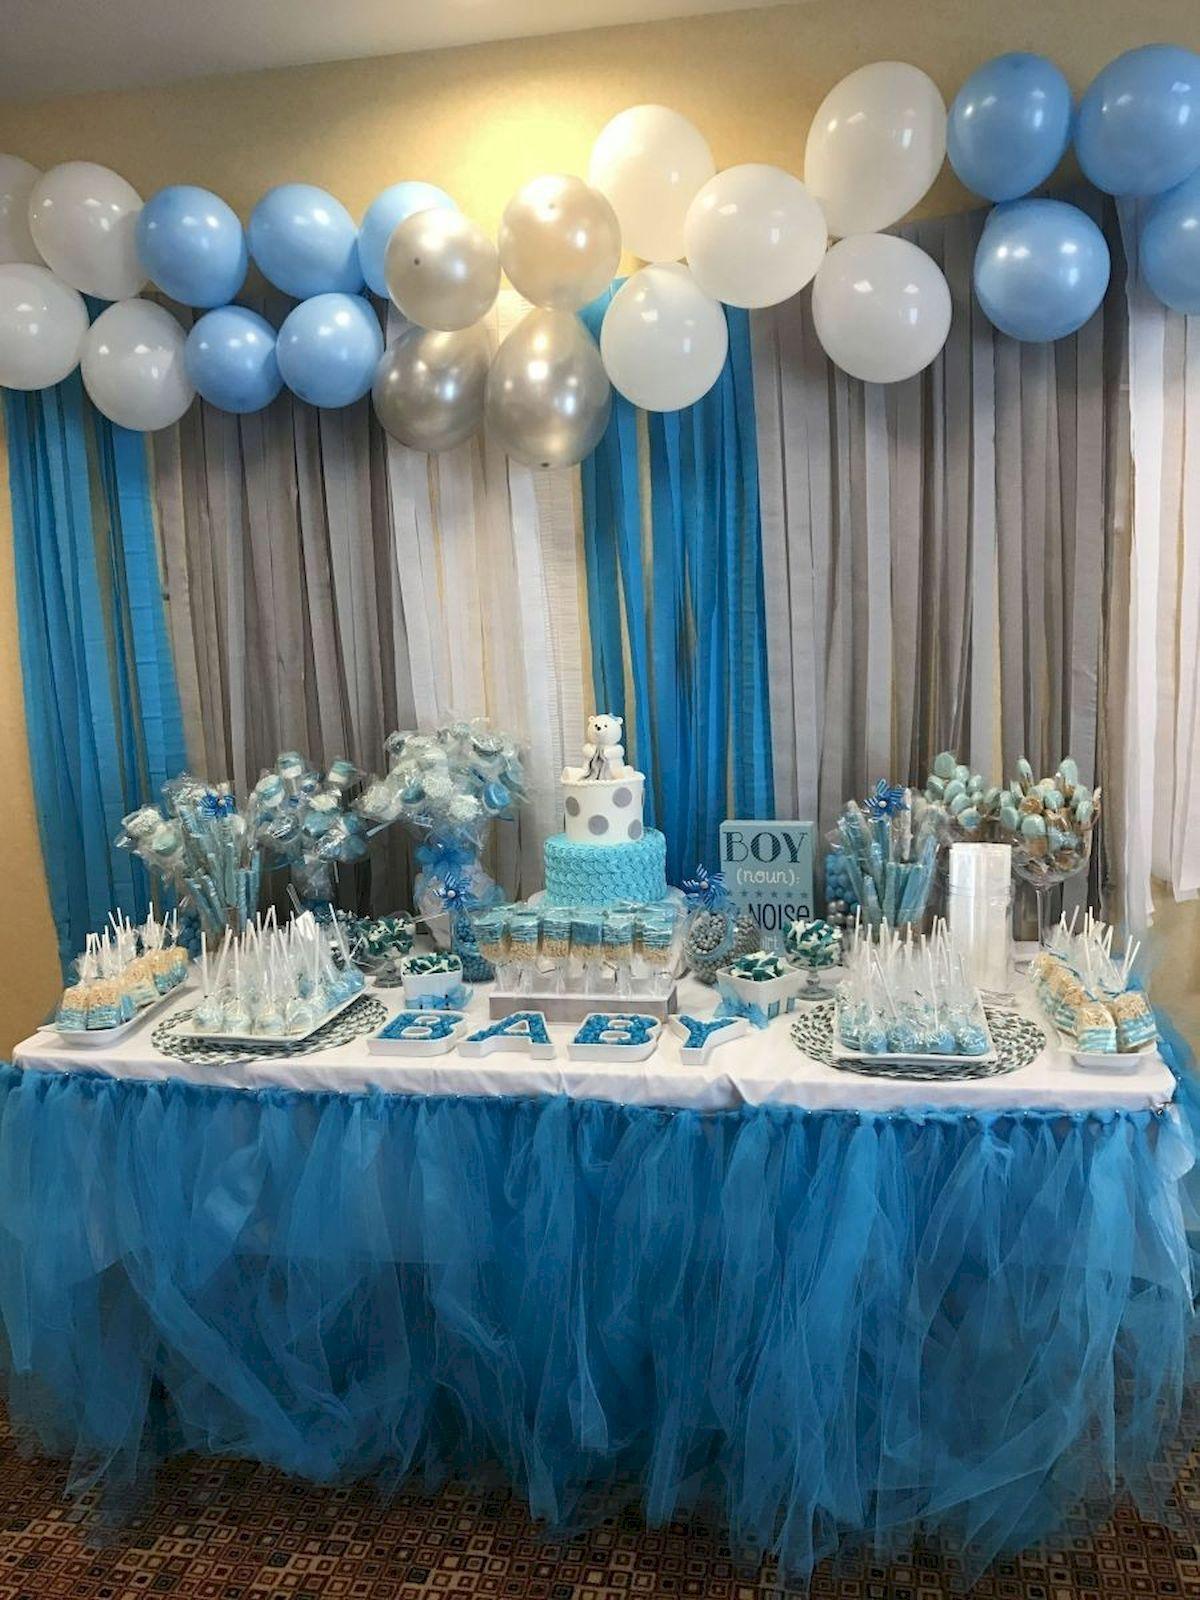 Decoracion De Baby Shower De Ni�o : decoracion, shower, Awesome, Shower, Themes, Decorating, Ideas, Decorations,, Menu,, Centerpieces